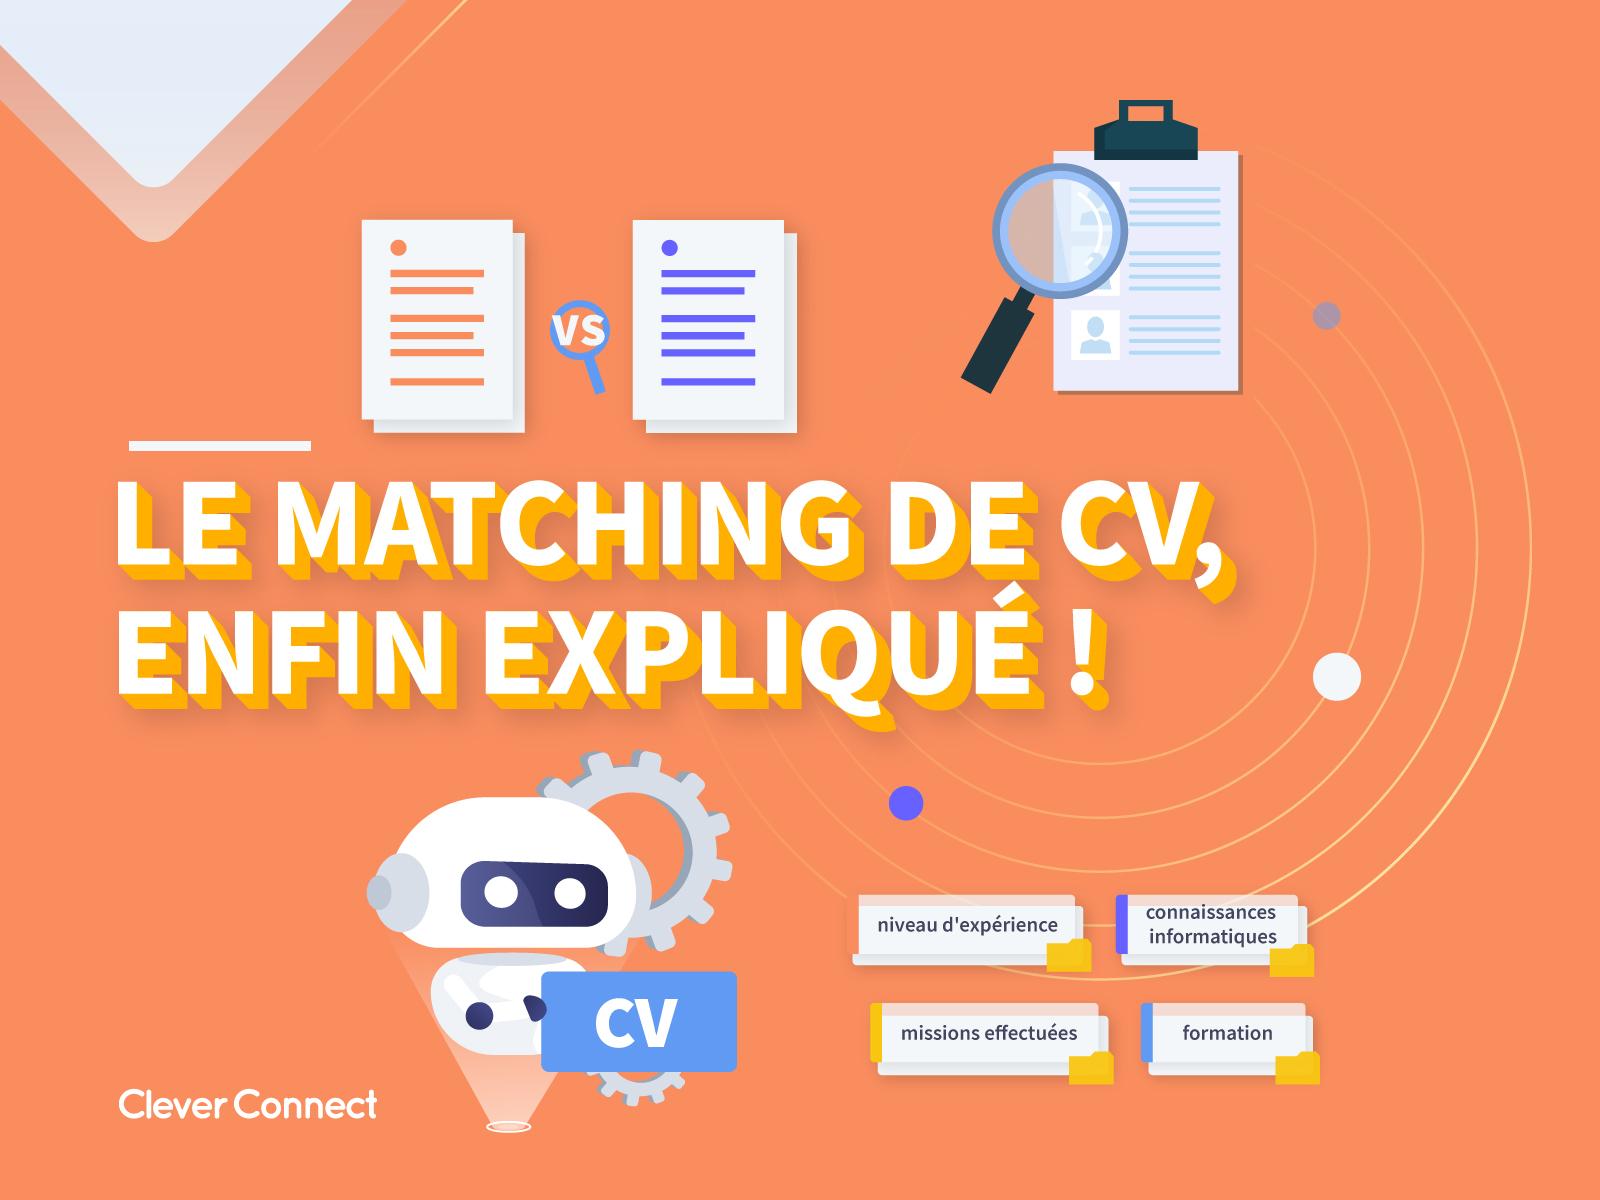 [Infographie] Le matching de CV, enfin expliqué